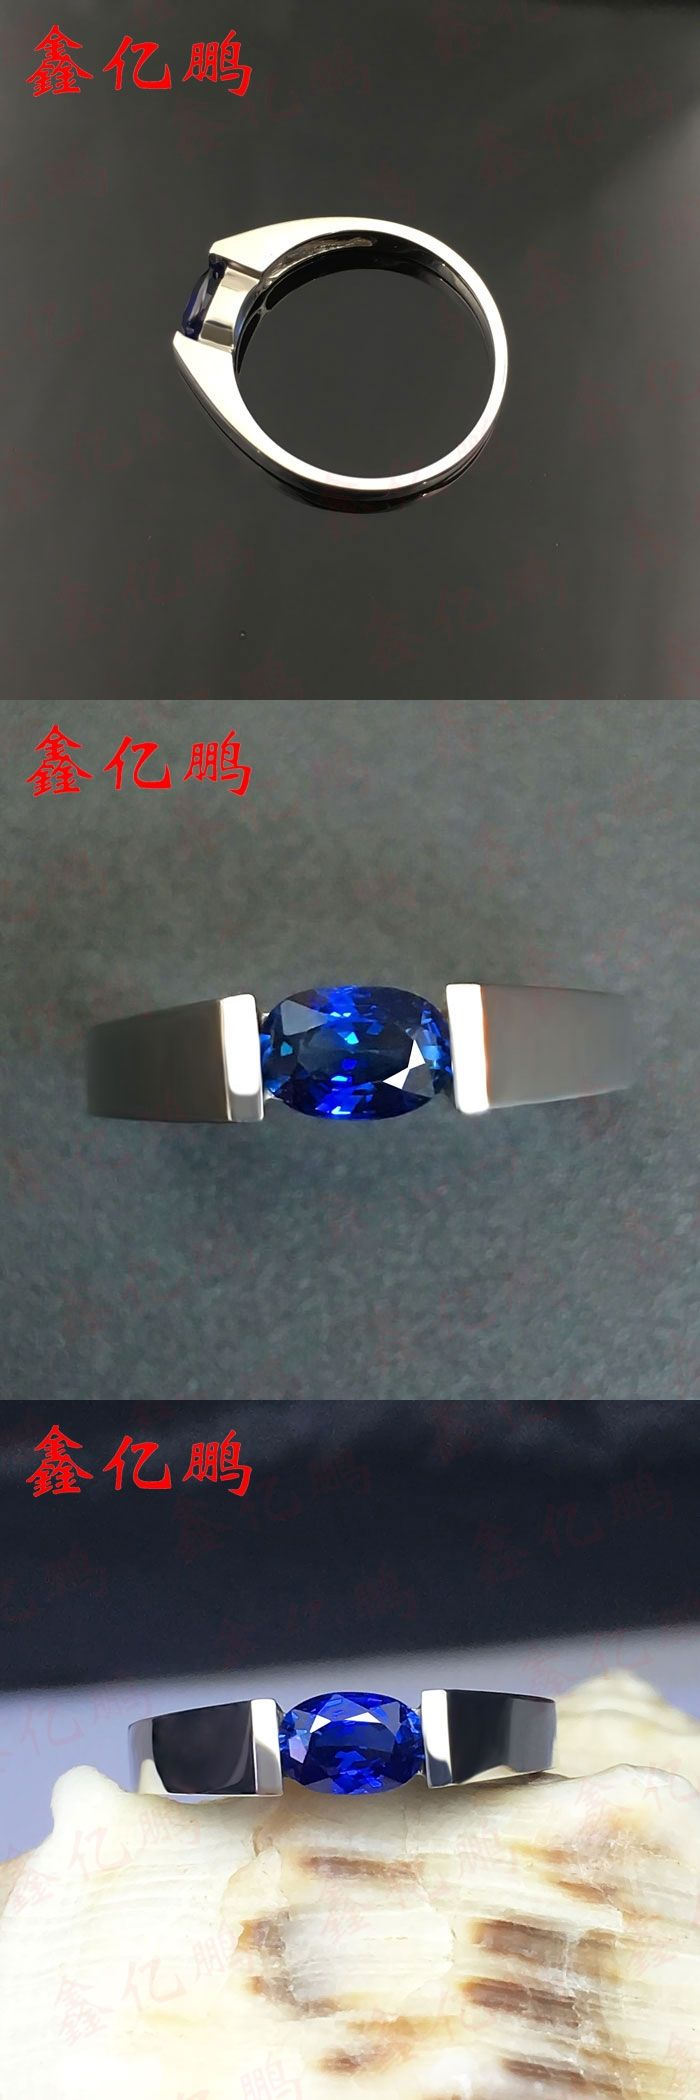 Natural sapphire ring Color bright royal blue 0.6 carat fire 18 k Bai Jingui heavy variety treasure female ring